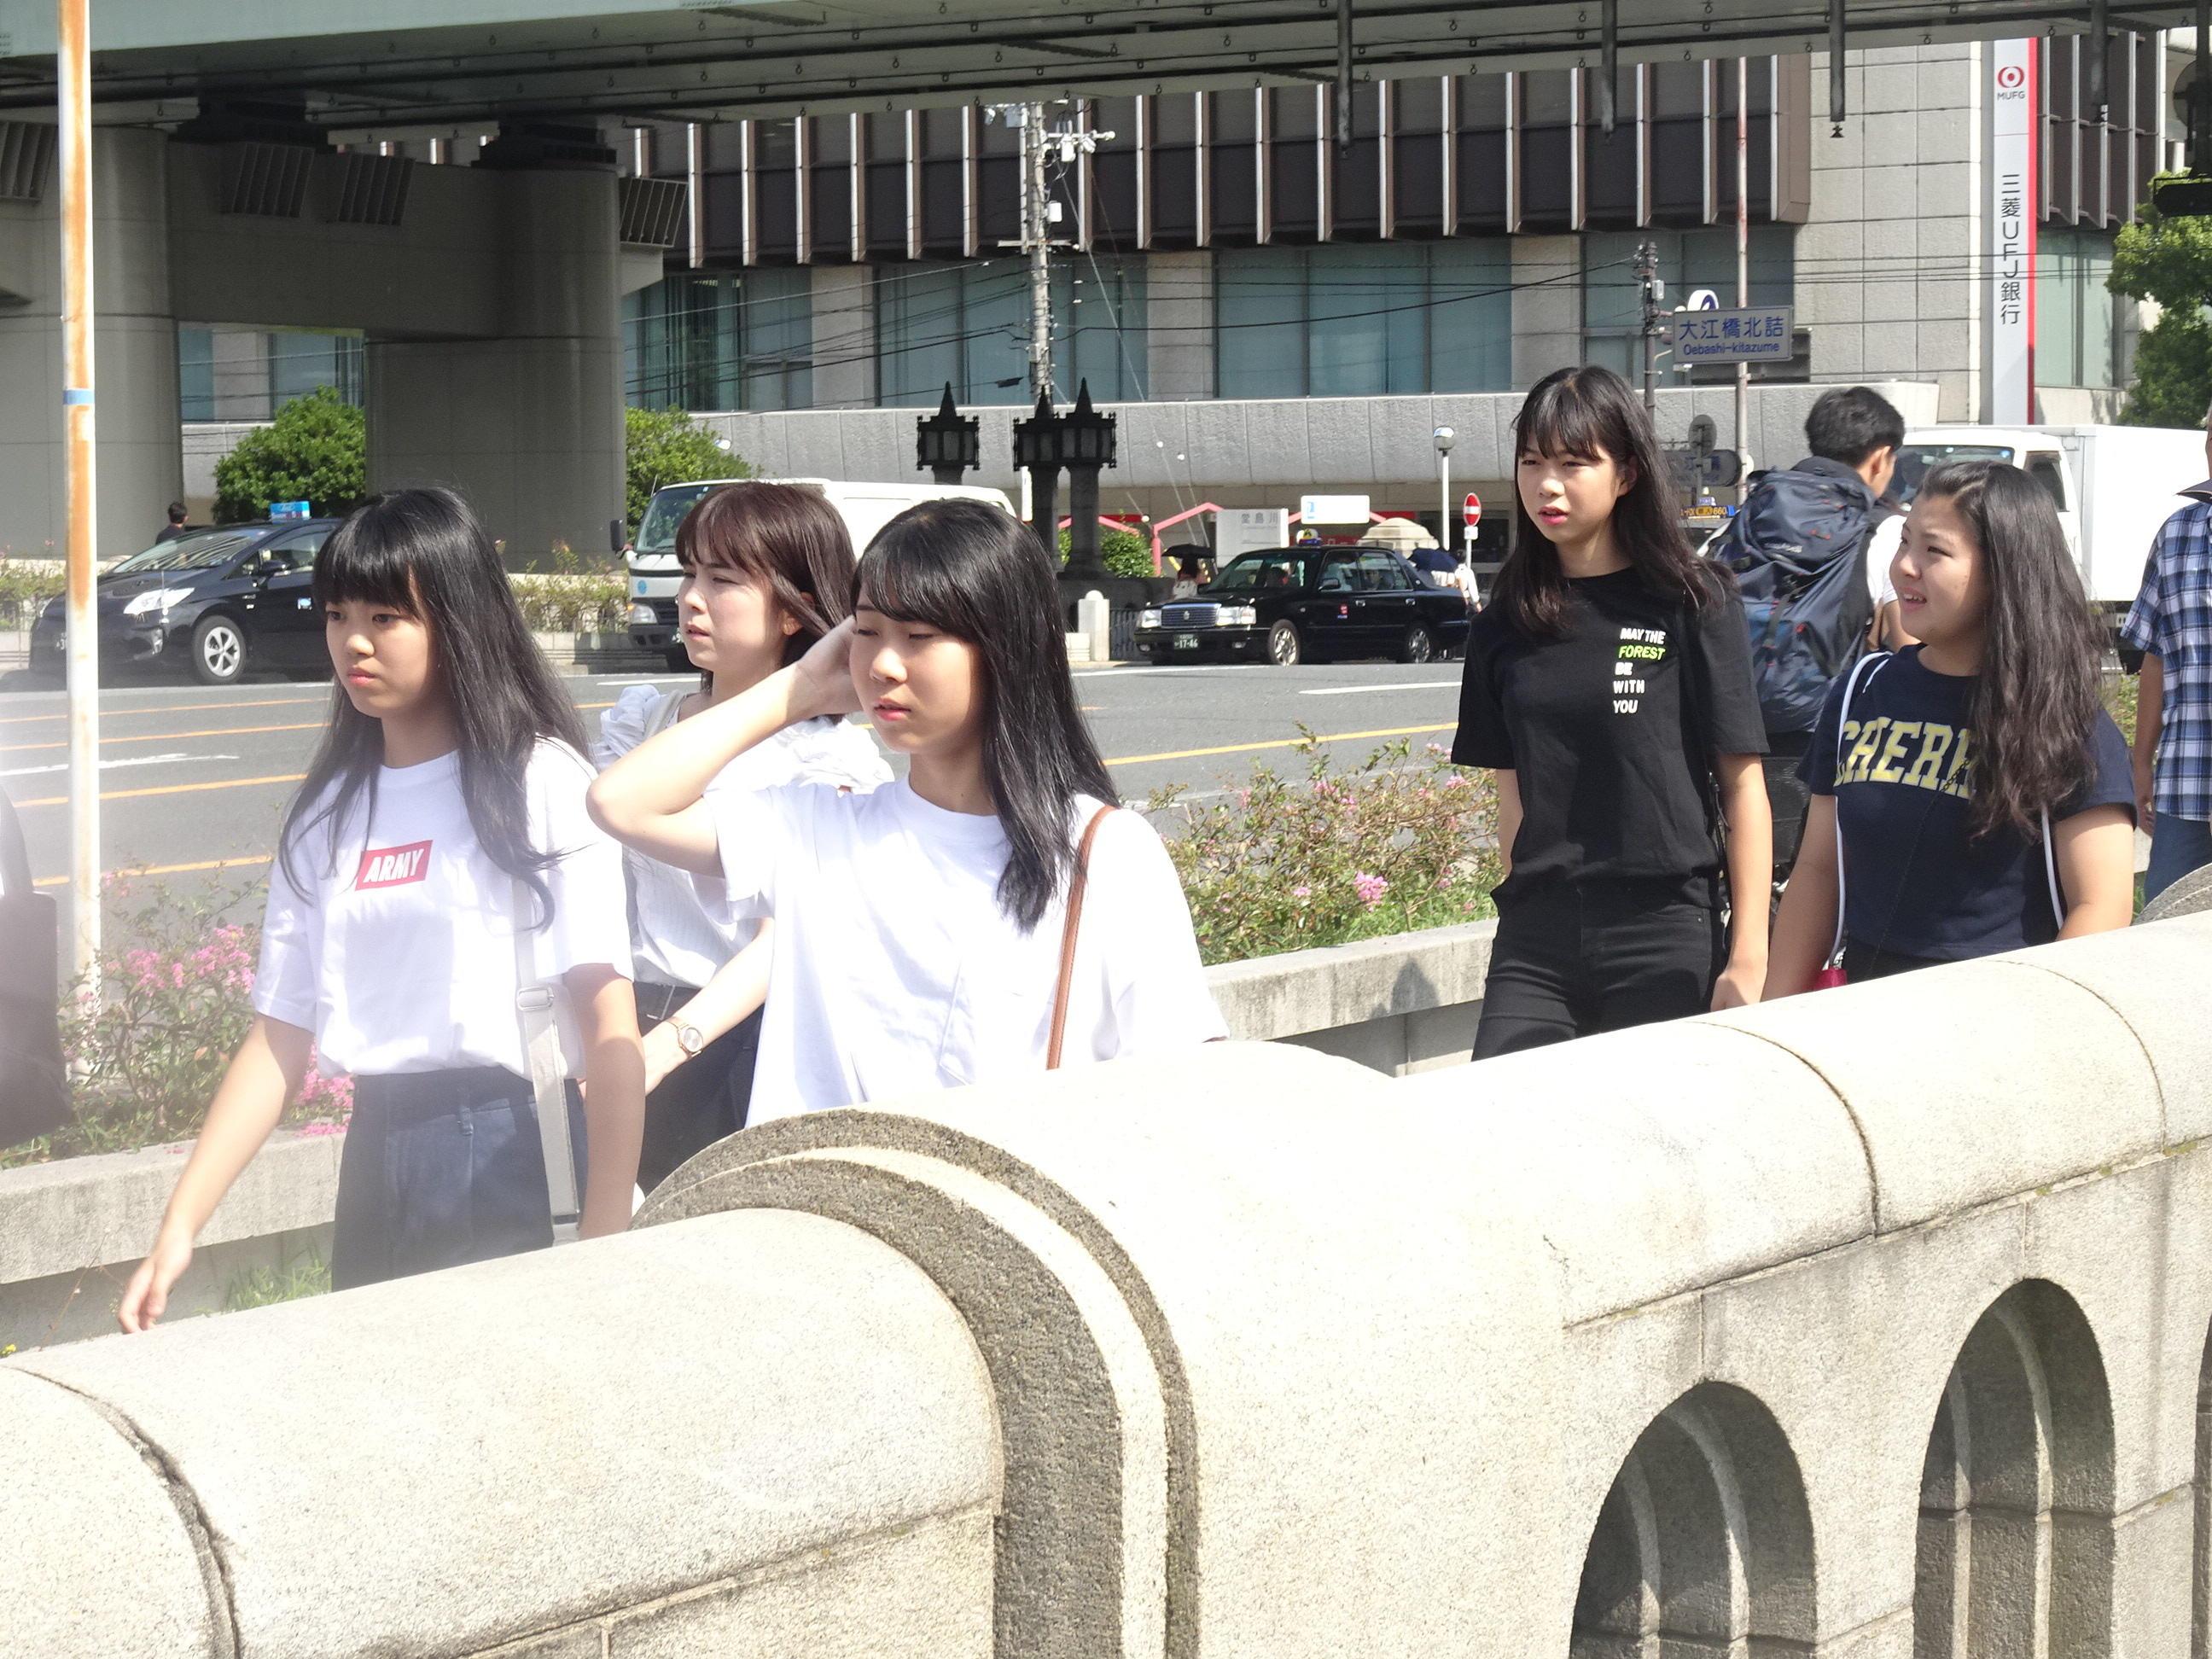 180803 To Tokyo (16).JPG